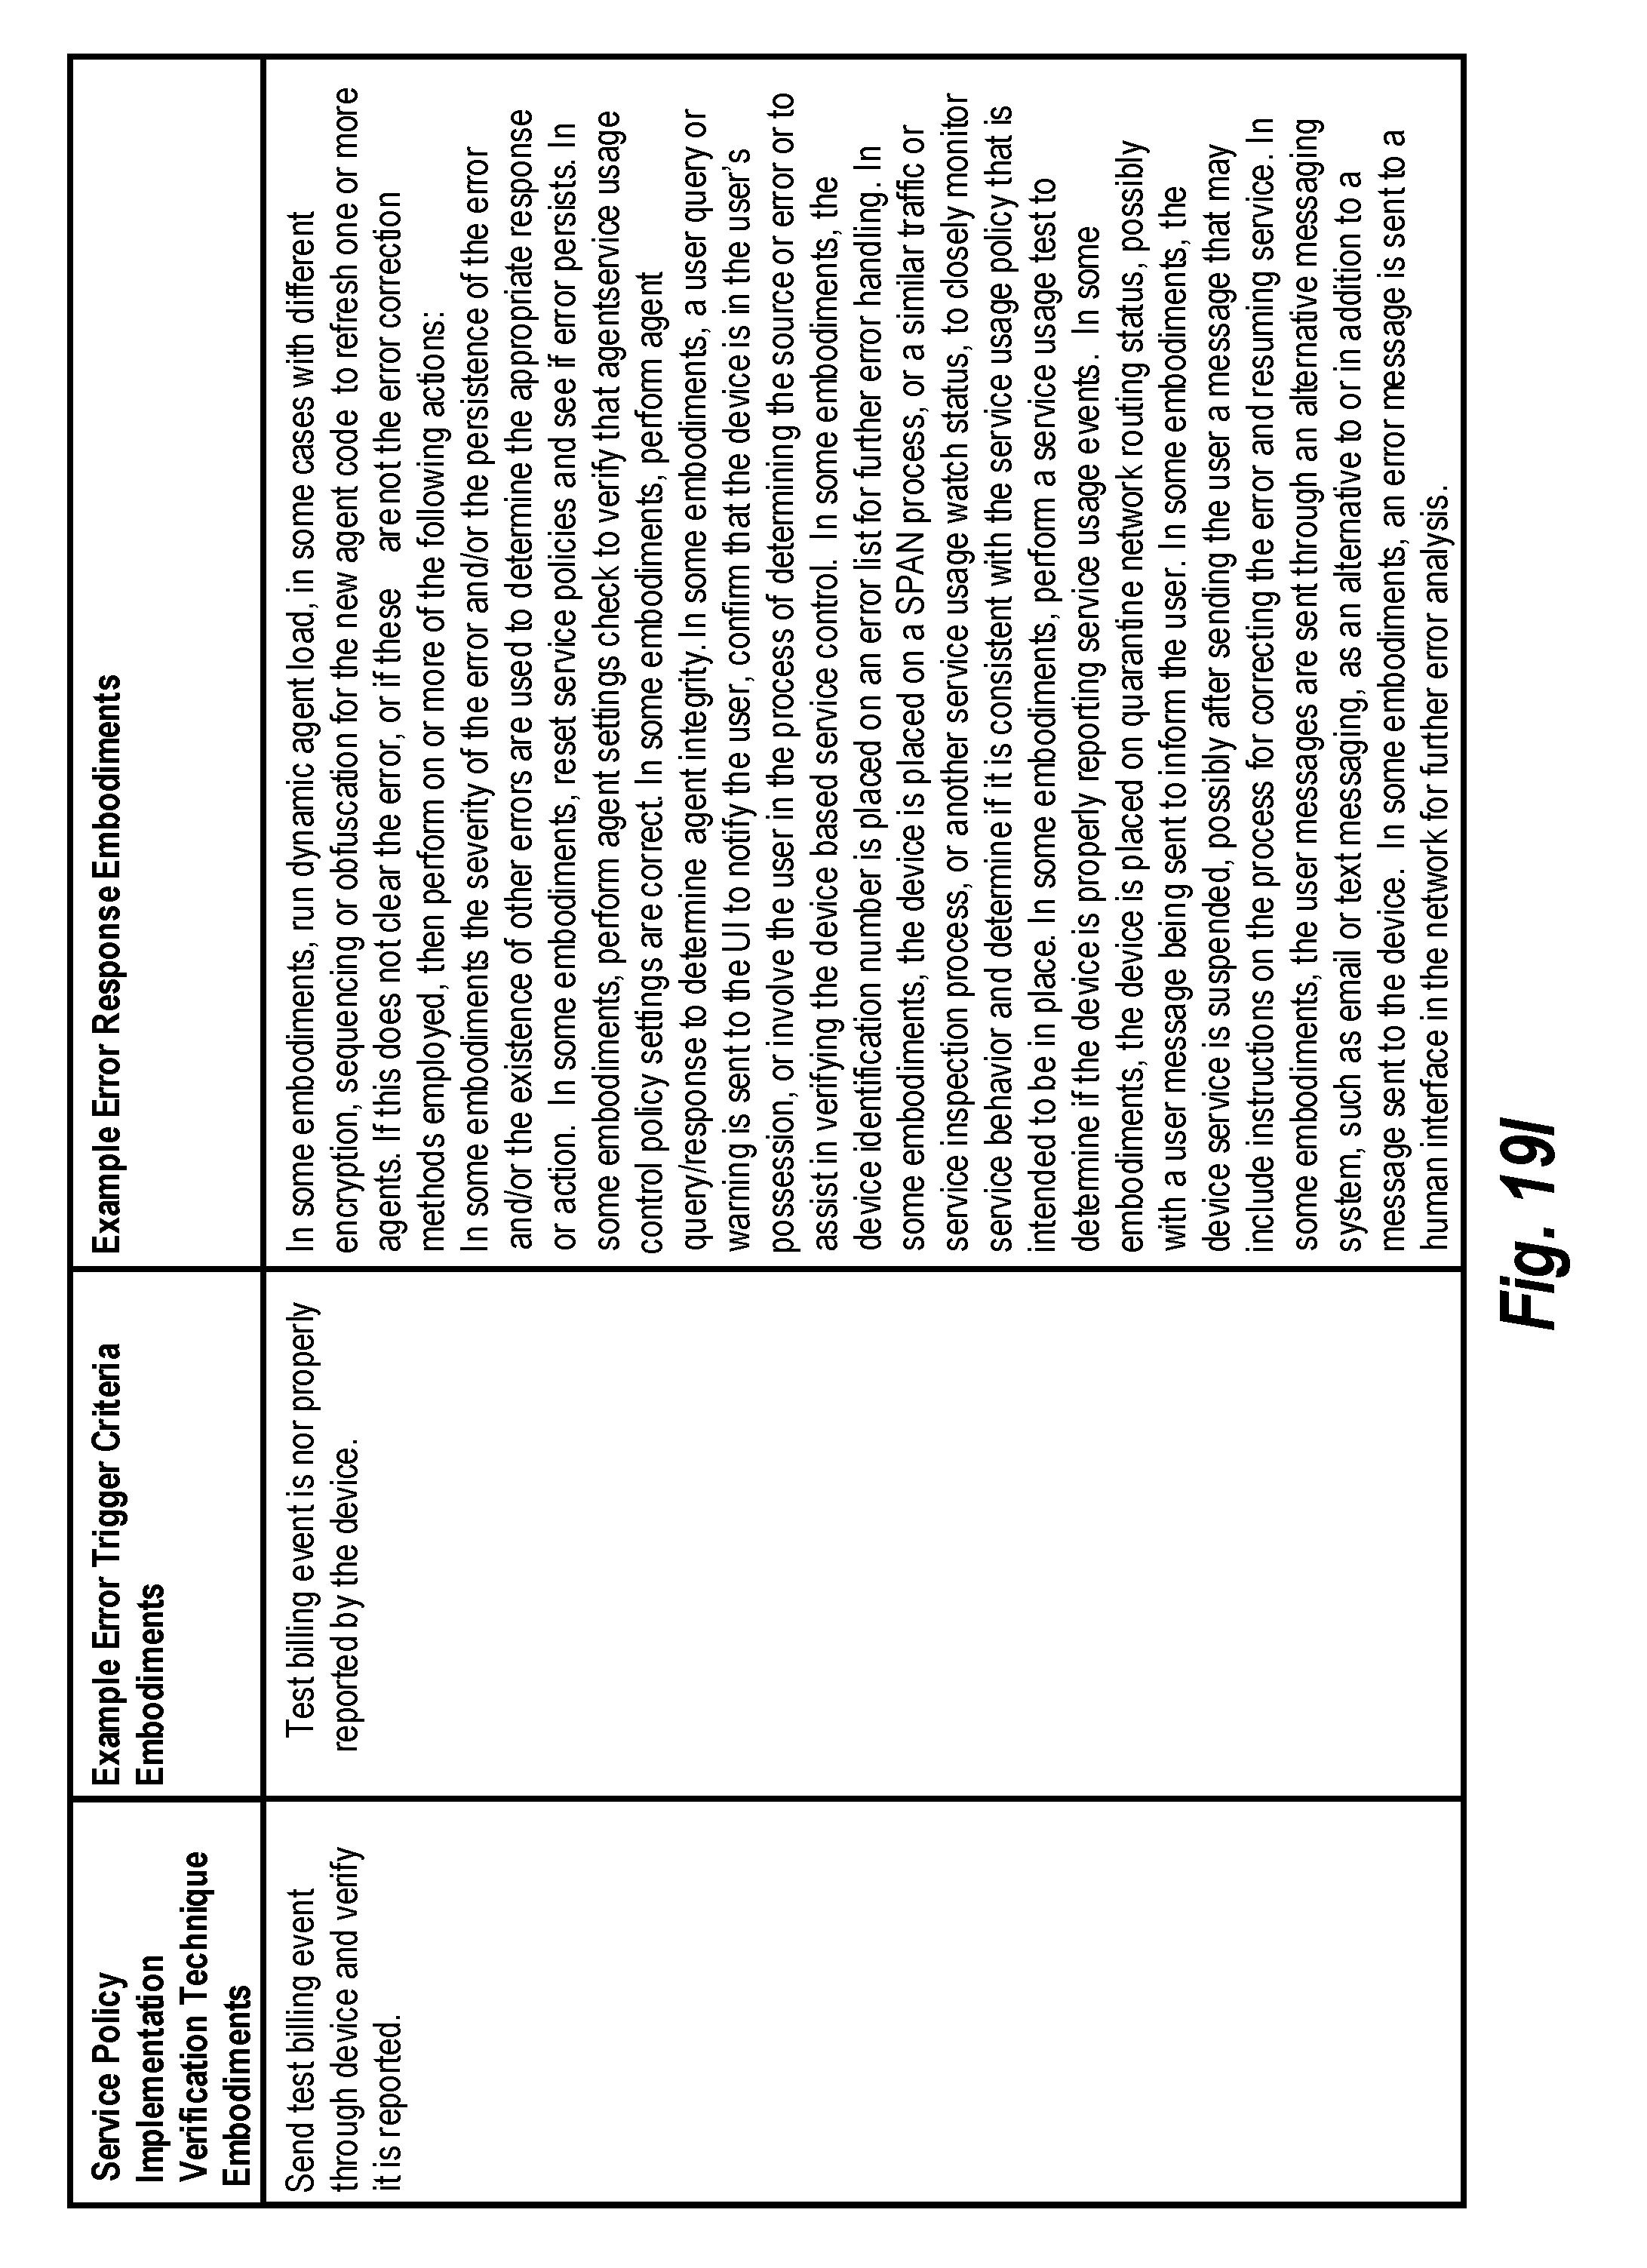 Patent US 10,171,988 B2